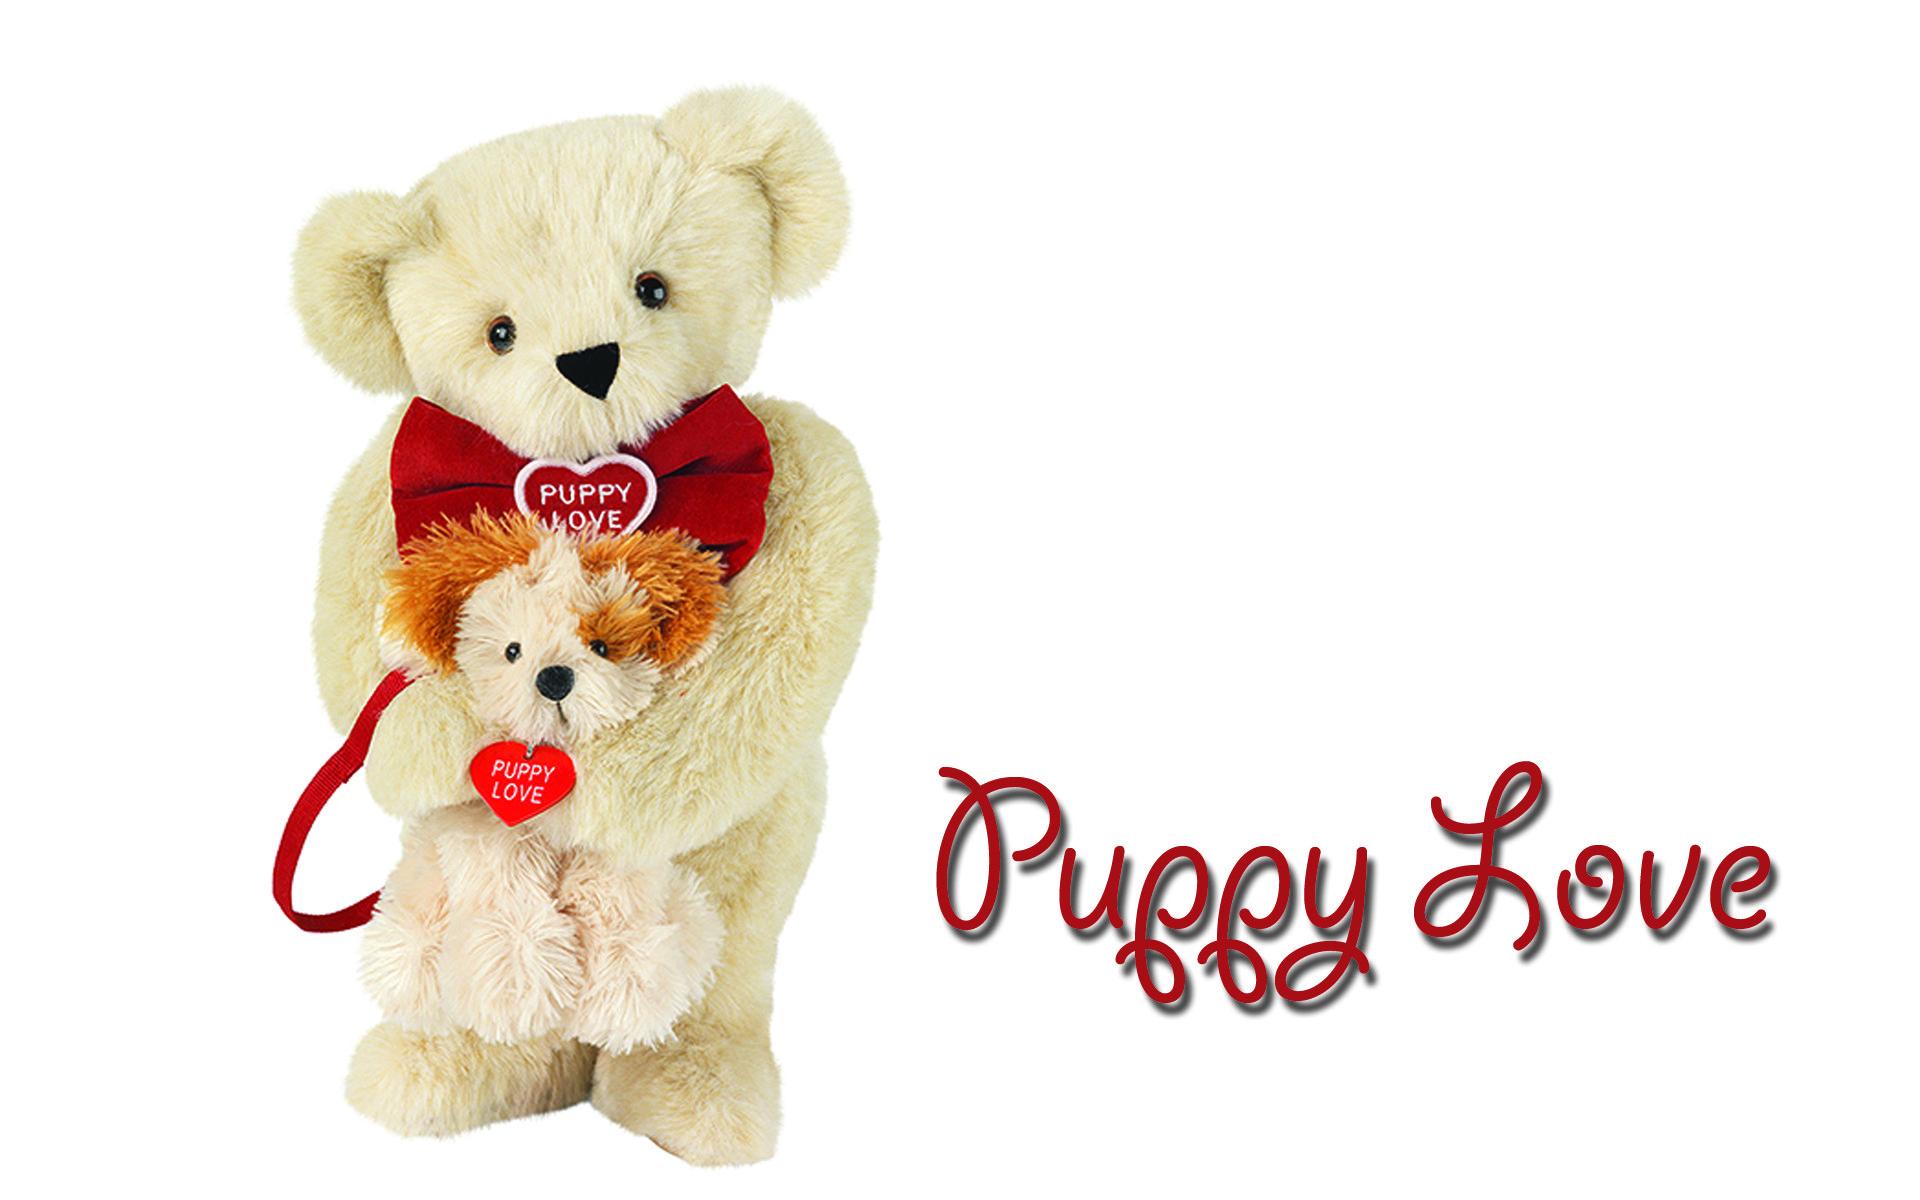 Cute Puppy Wishes Happy Teddy Bear Day Wallpapers Teddy Bear In